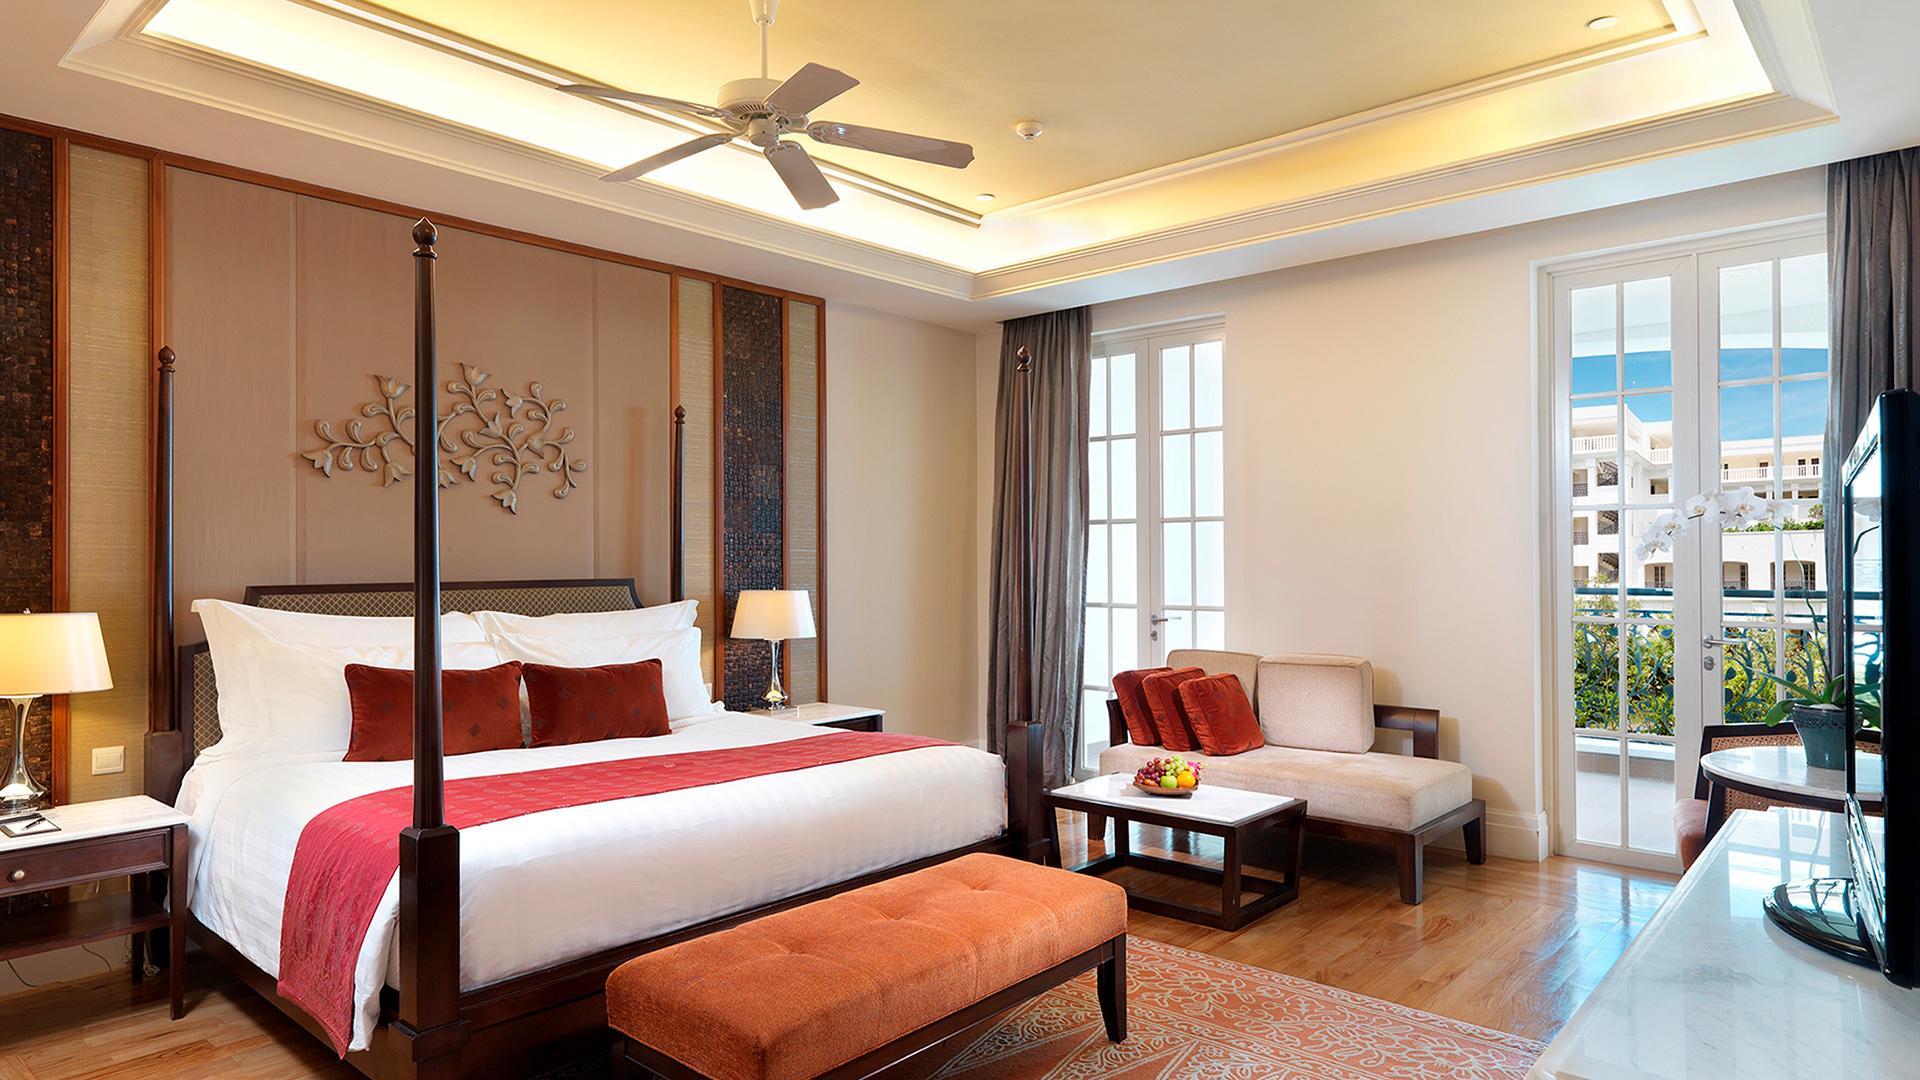 Merchant Room image 1 at The Danna Langkawi by null, Kedah, Malaysia